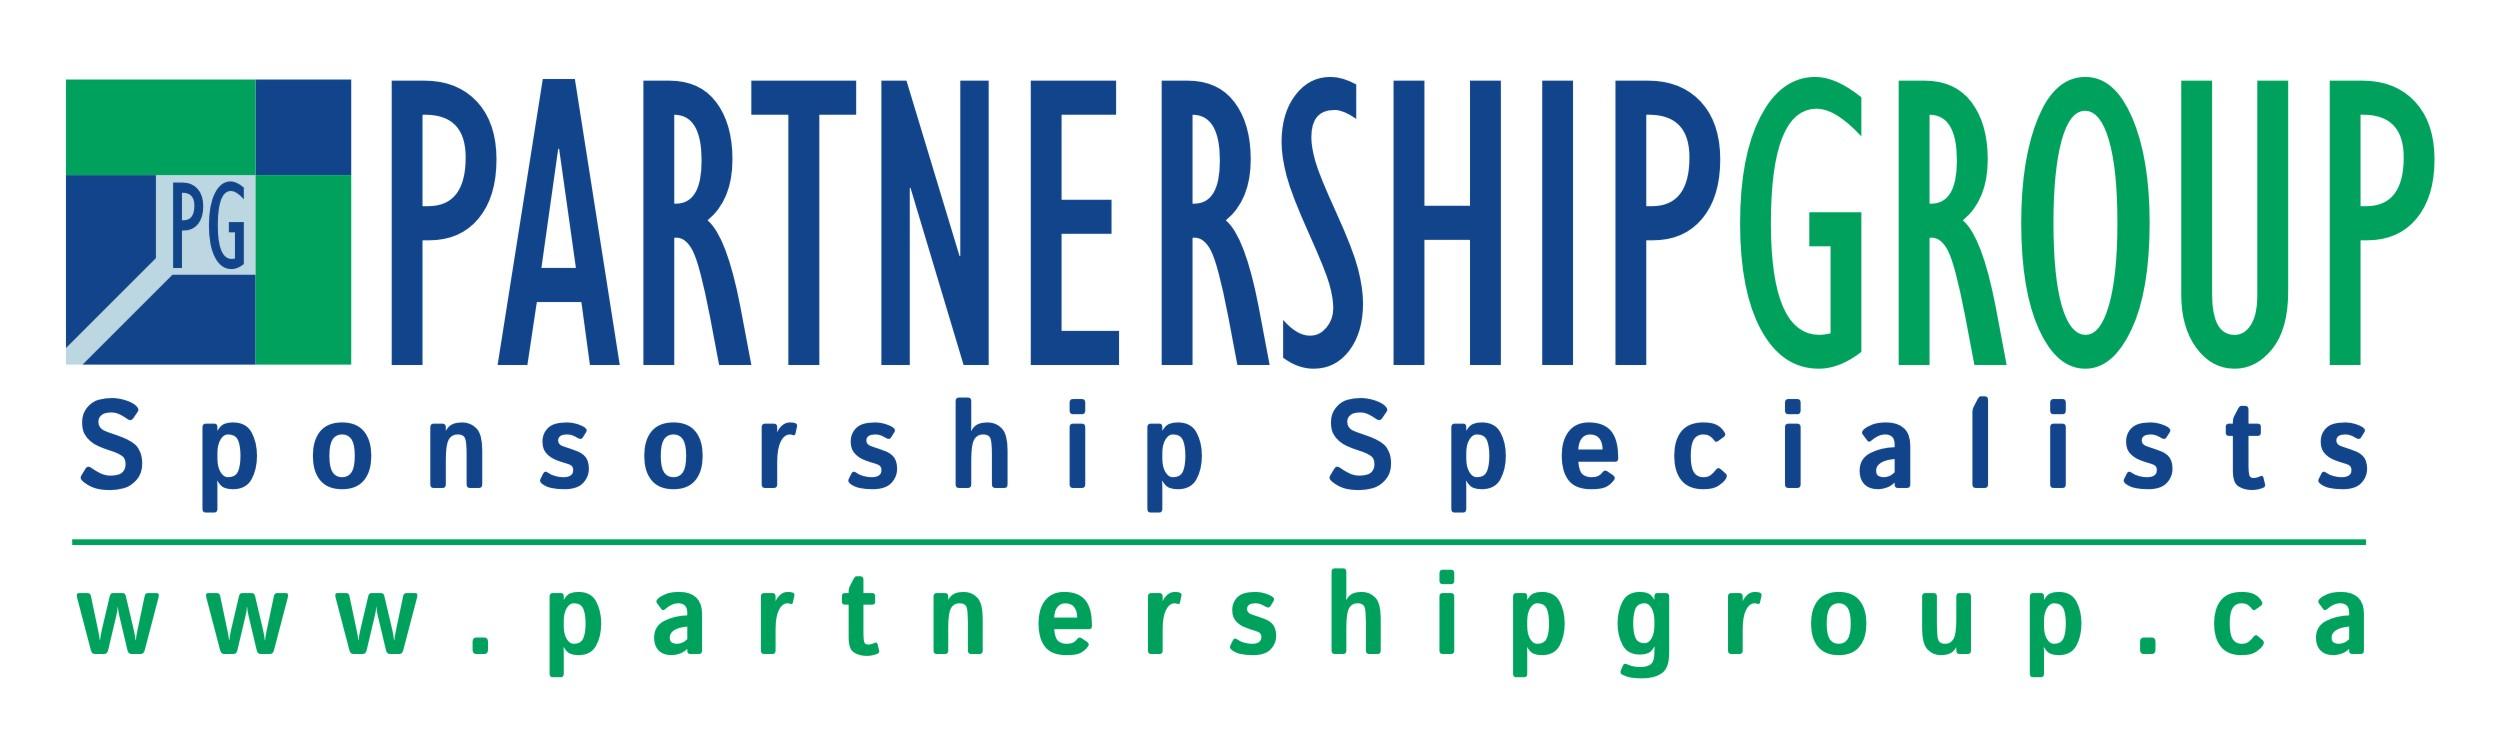 PG Updated Logo 2015 - Web.jpg